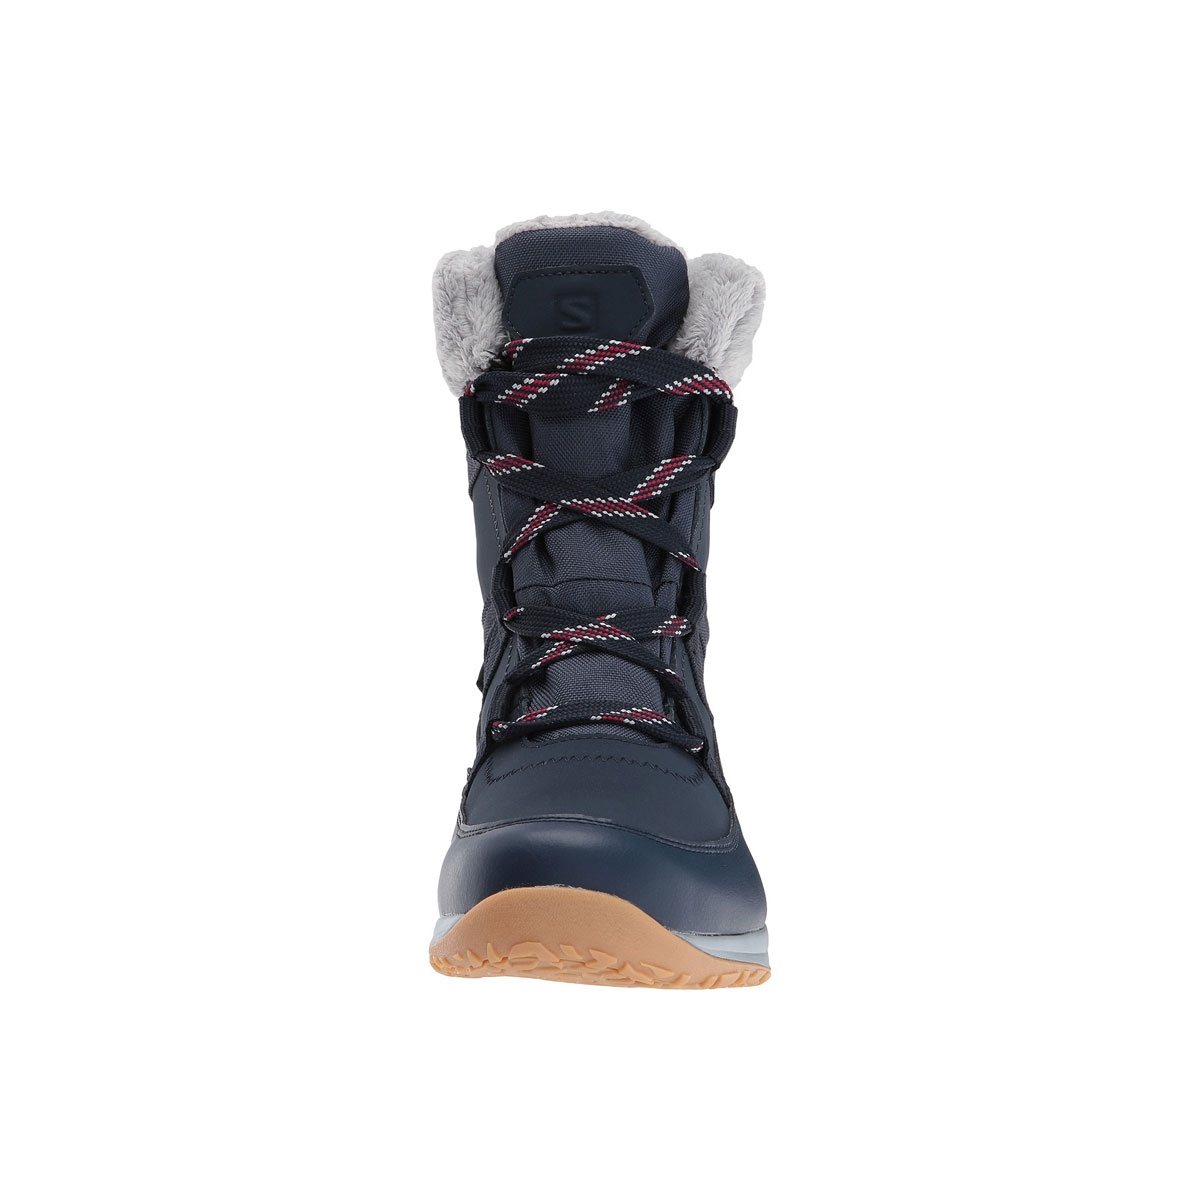 ad93b236e77e ... Image of Salomon Heika LTR CS WP Womens Winter Boots (Women s) - Navy  Blazer